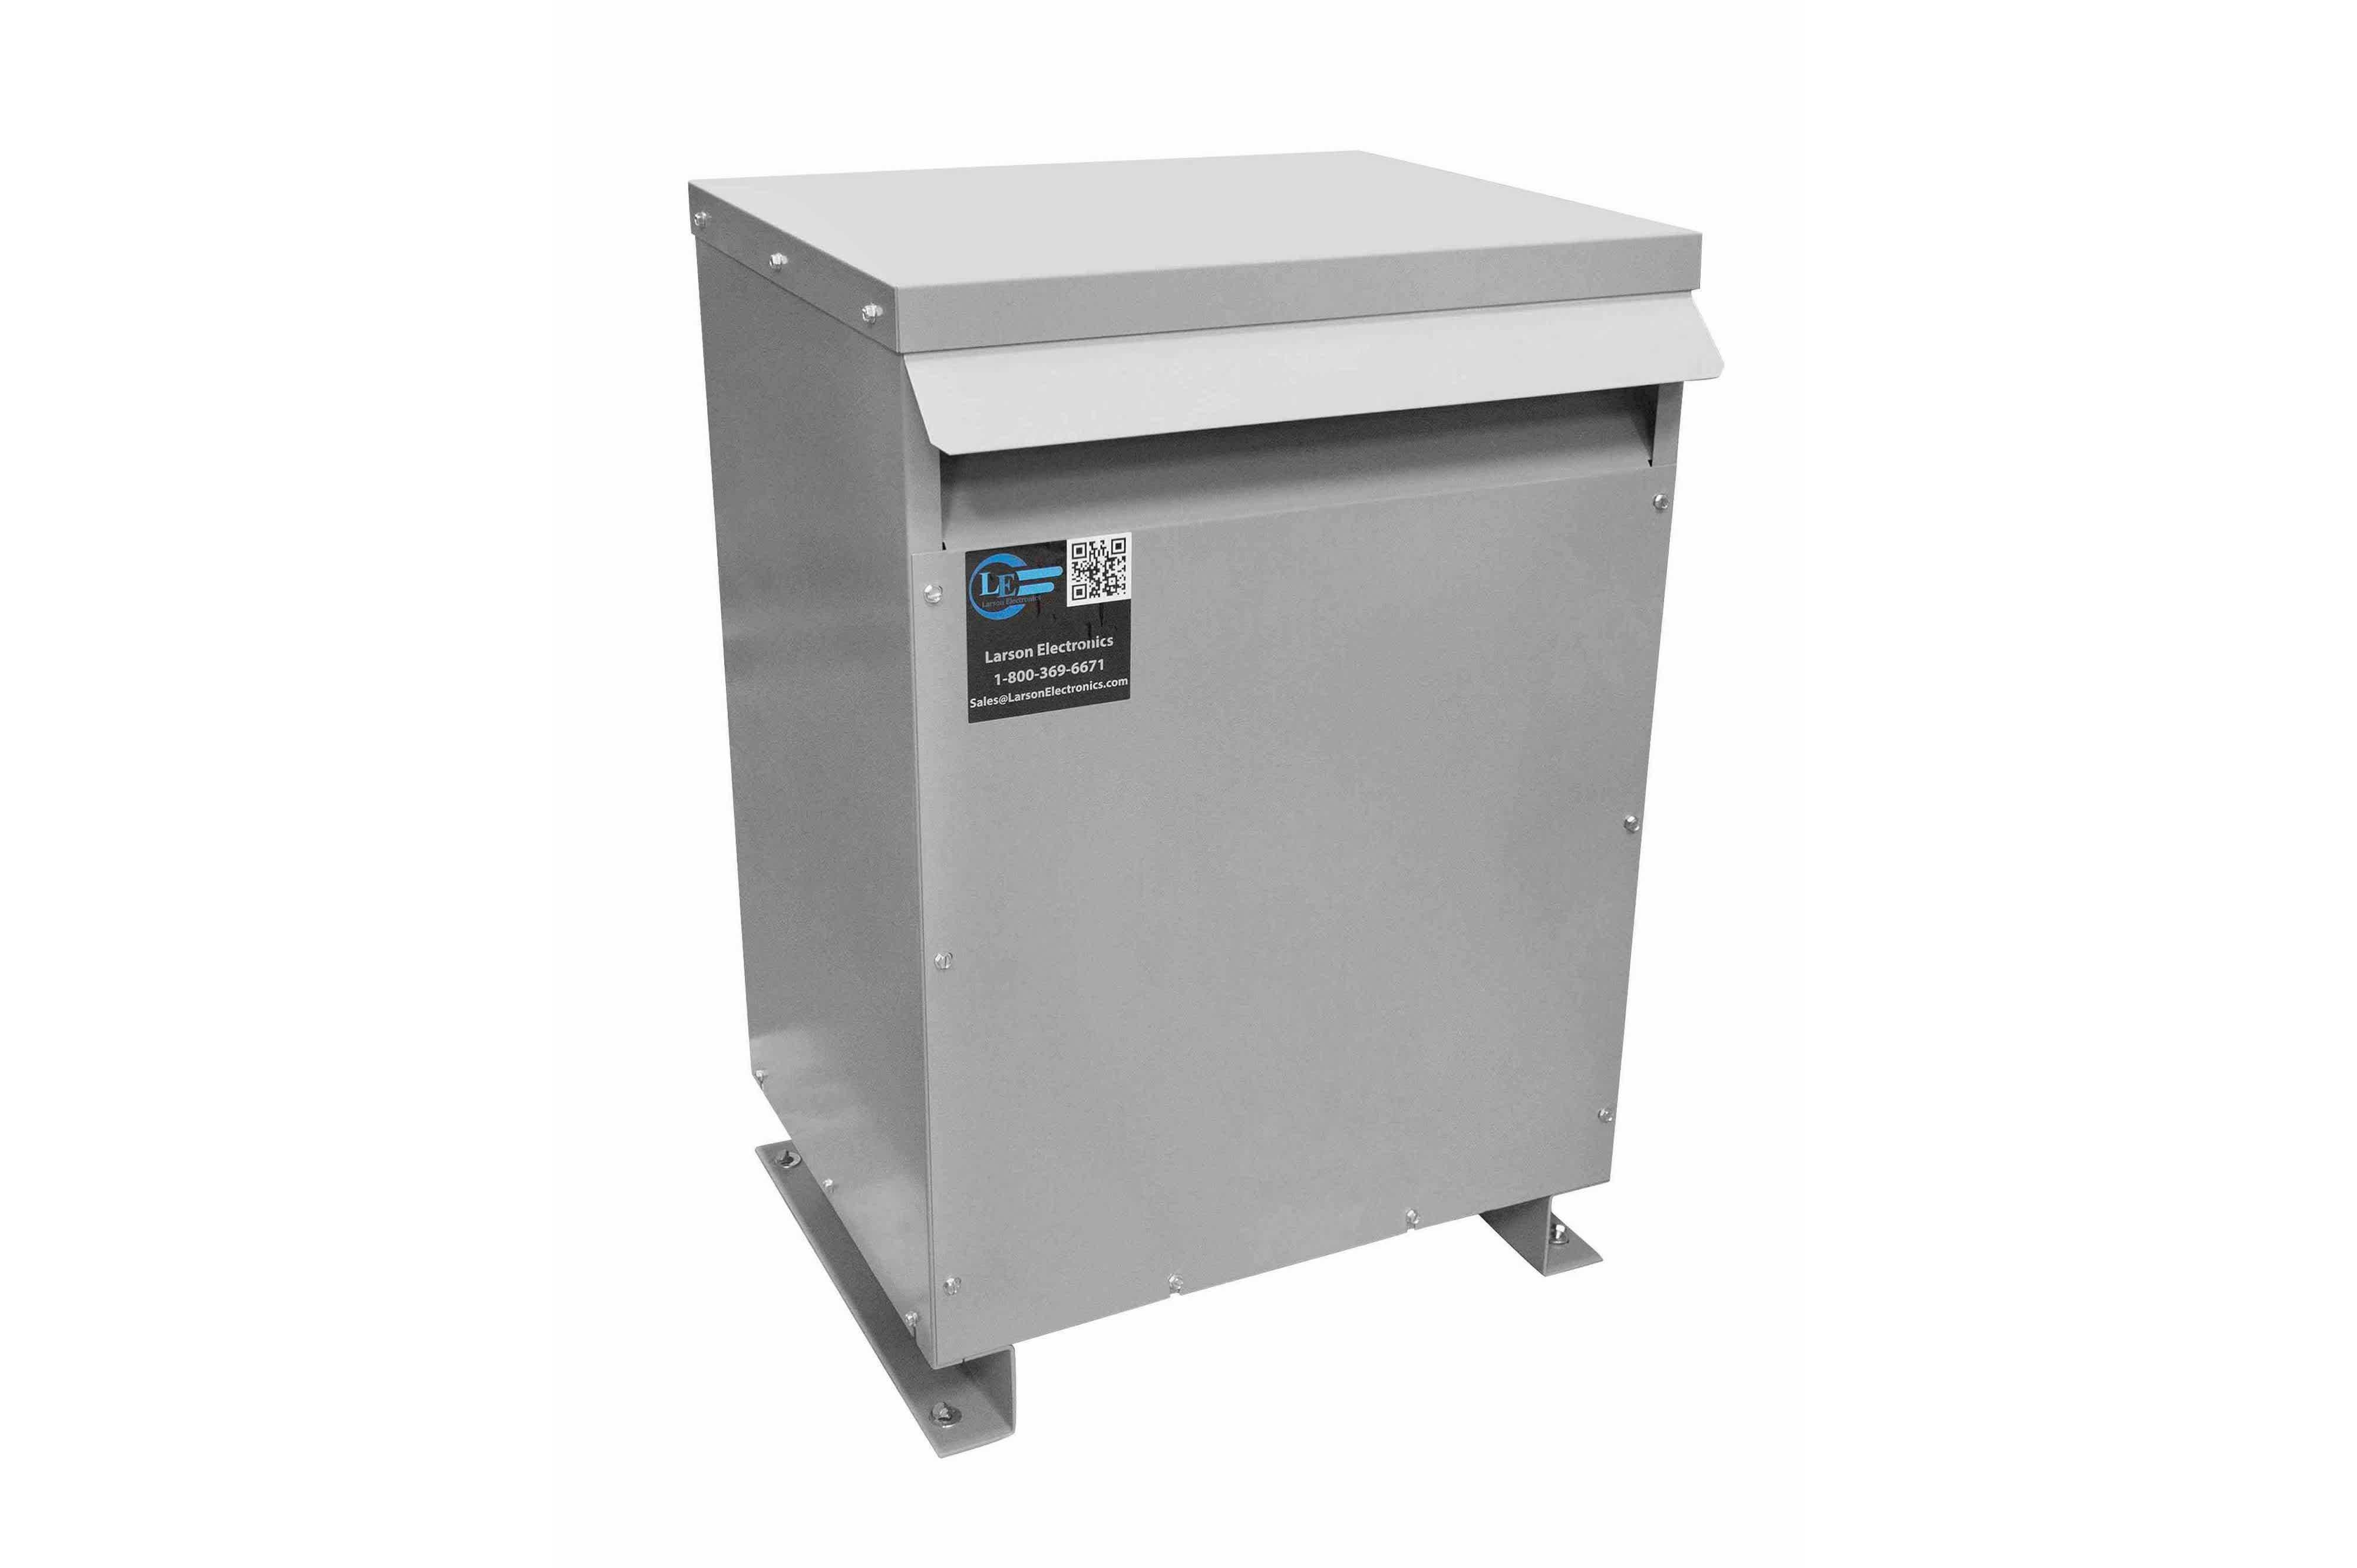 70 kVA 3PH Isolation Transformer, 480V Wye Primary, 400V Delta Secondary, N3R, Ventilated, 60 Hz